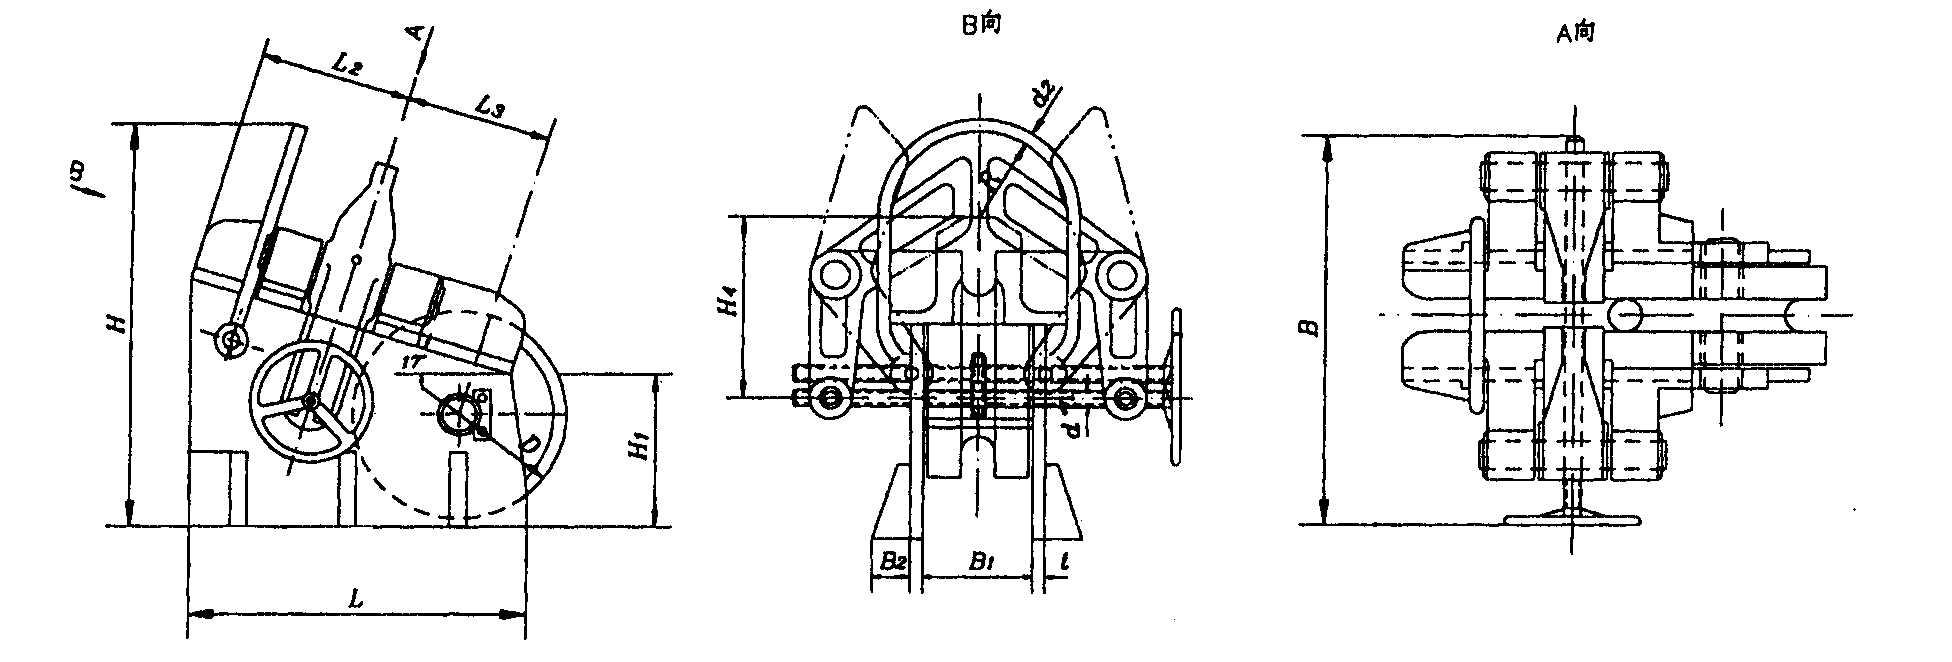 BAR stopper-chain